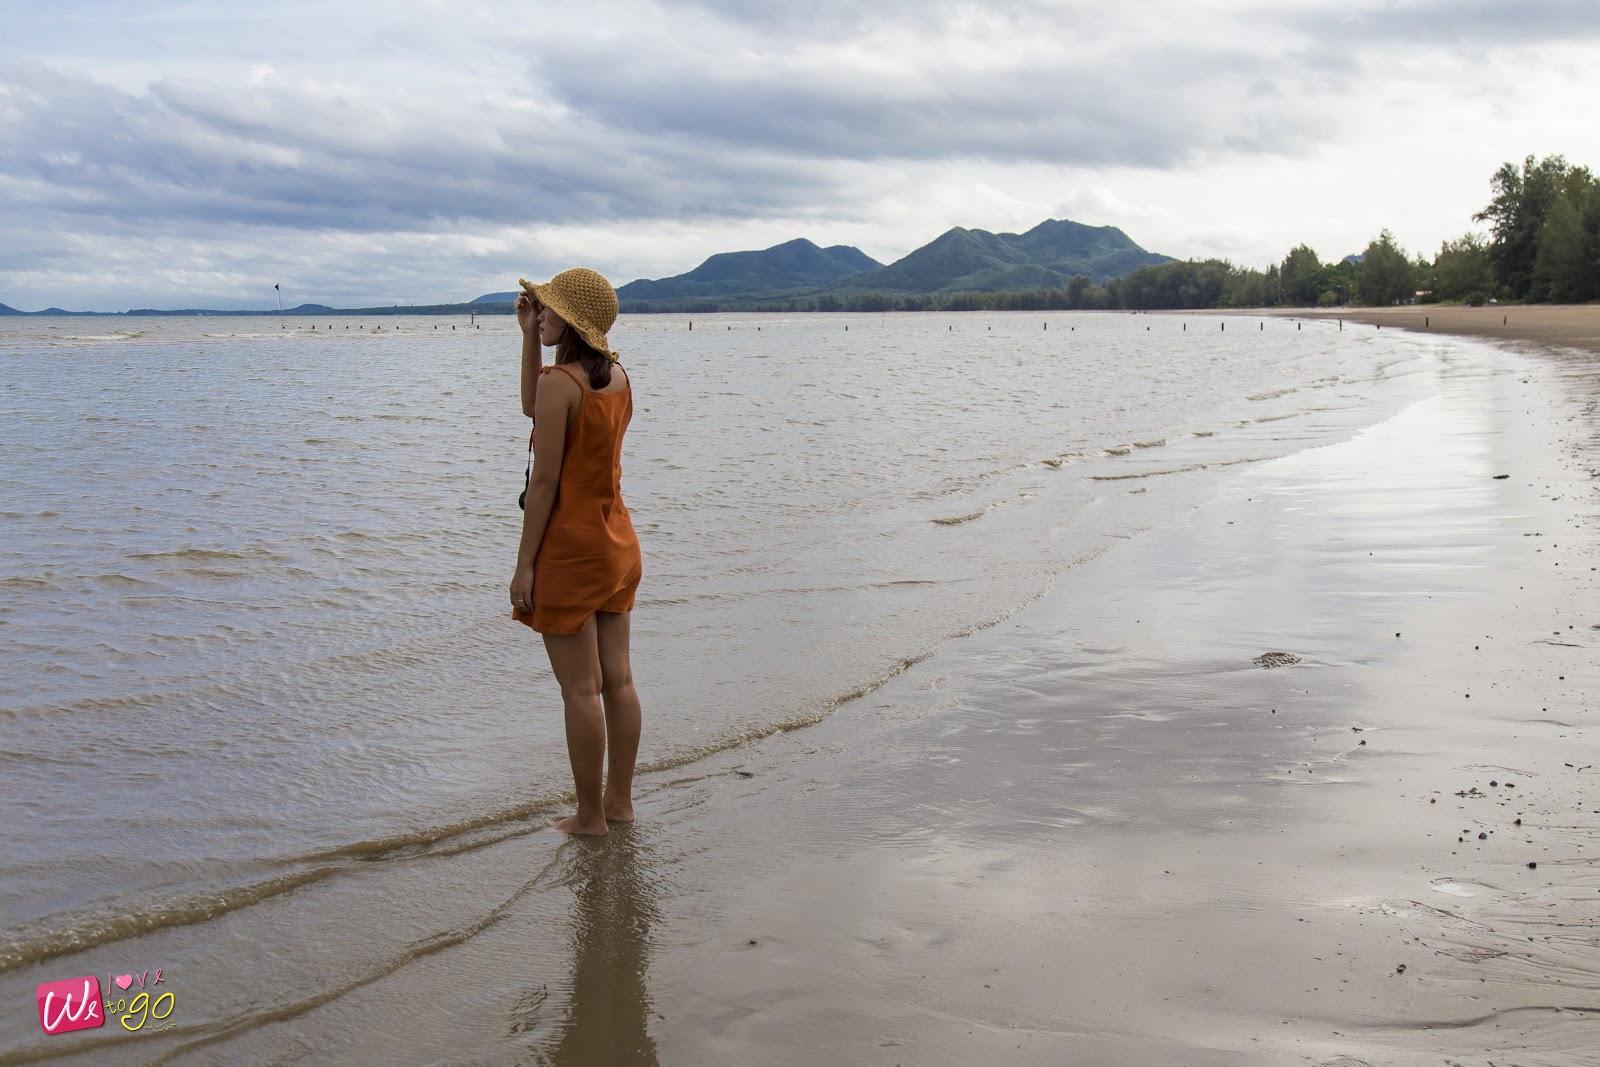 ranong chumphon rainy season trip123